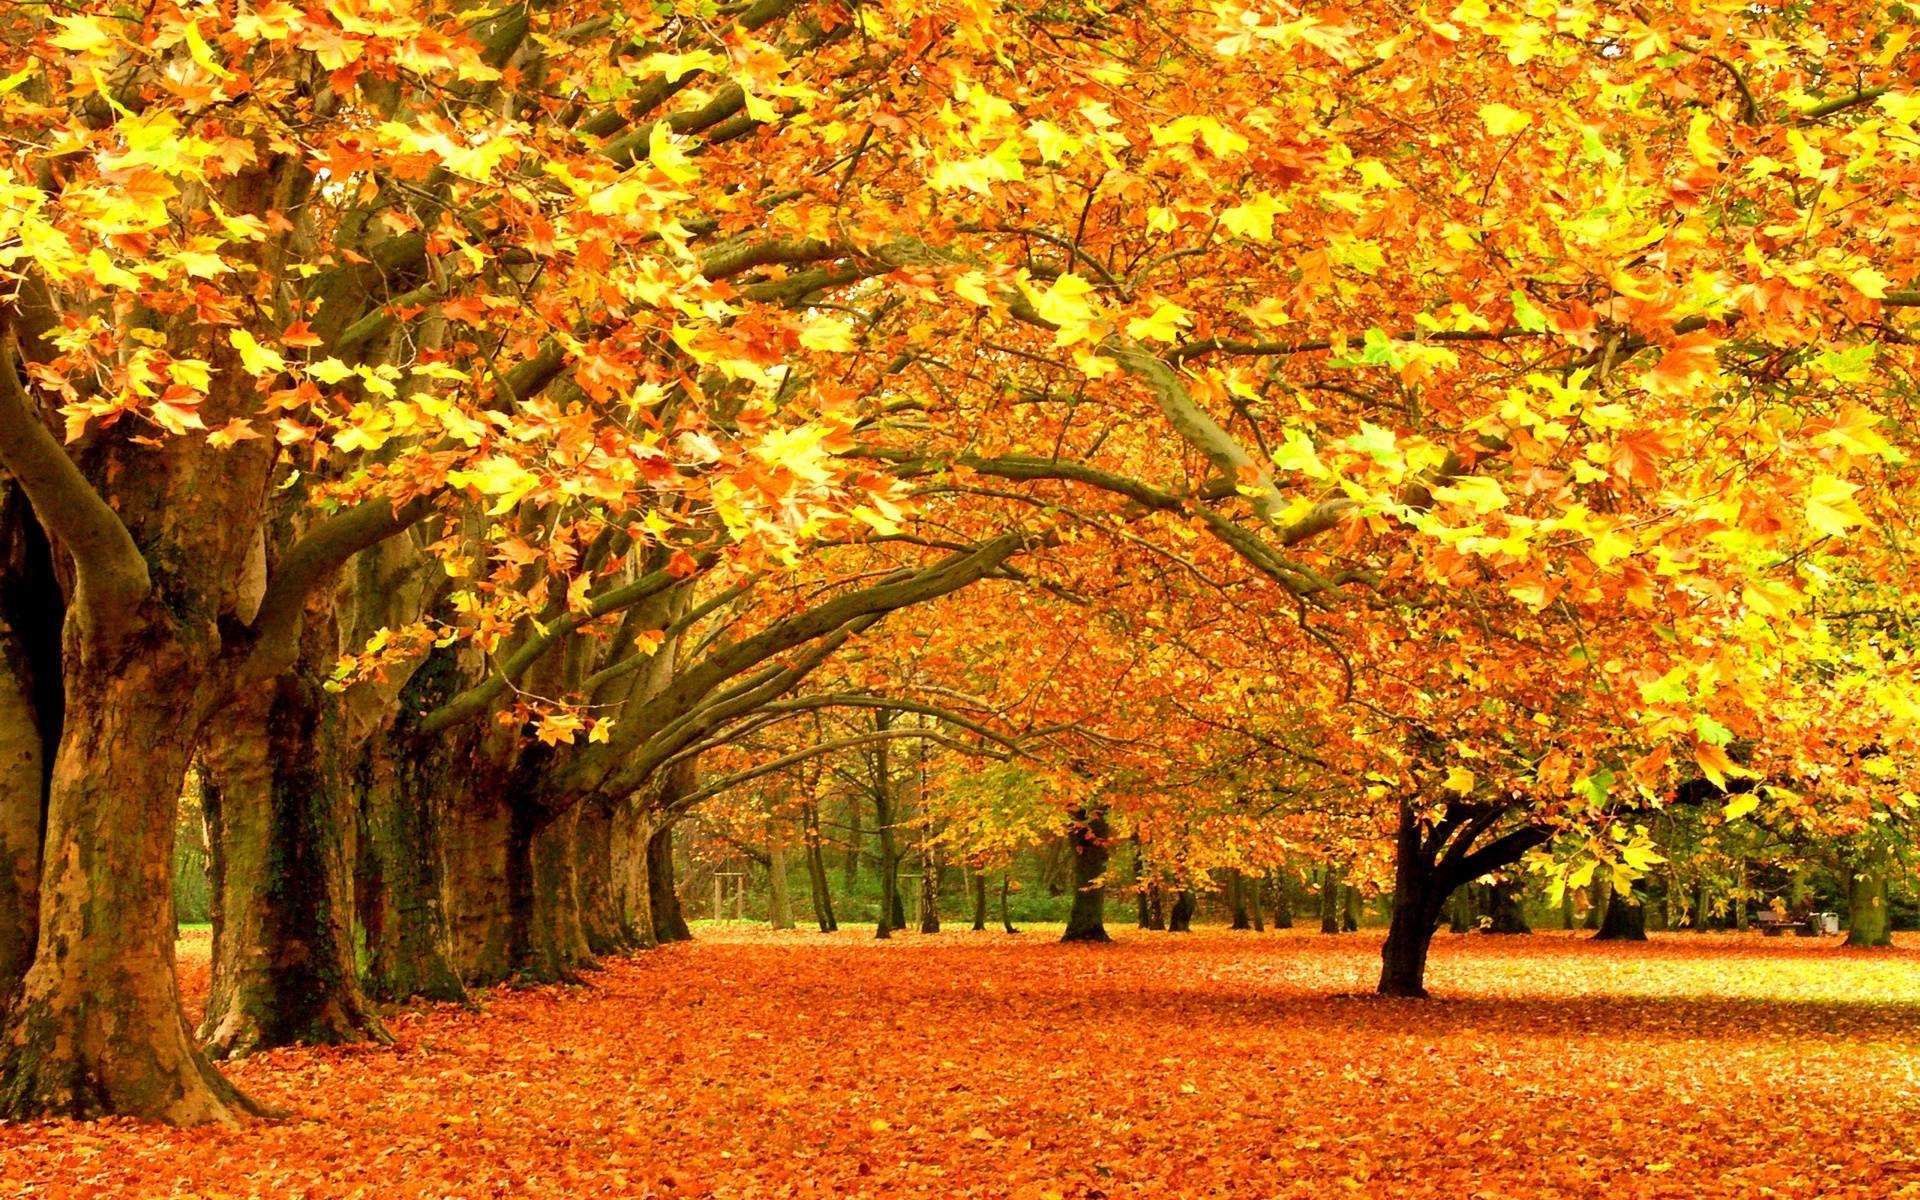 Fall Foliage Wallpaper Hd Autumn Scenery Autumn Scenes Autumn Nature